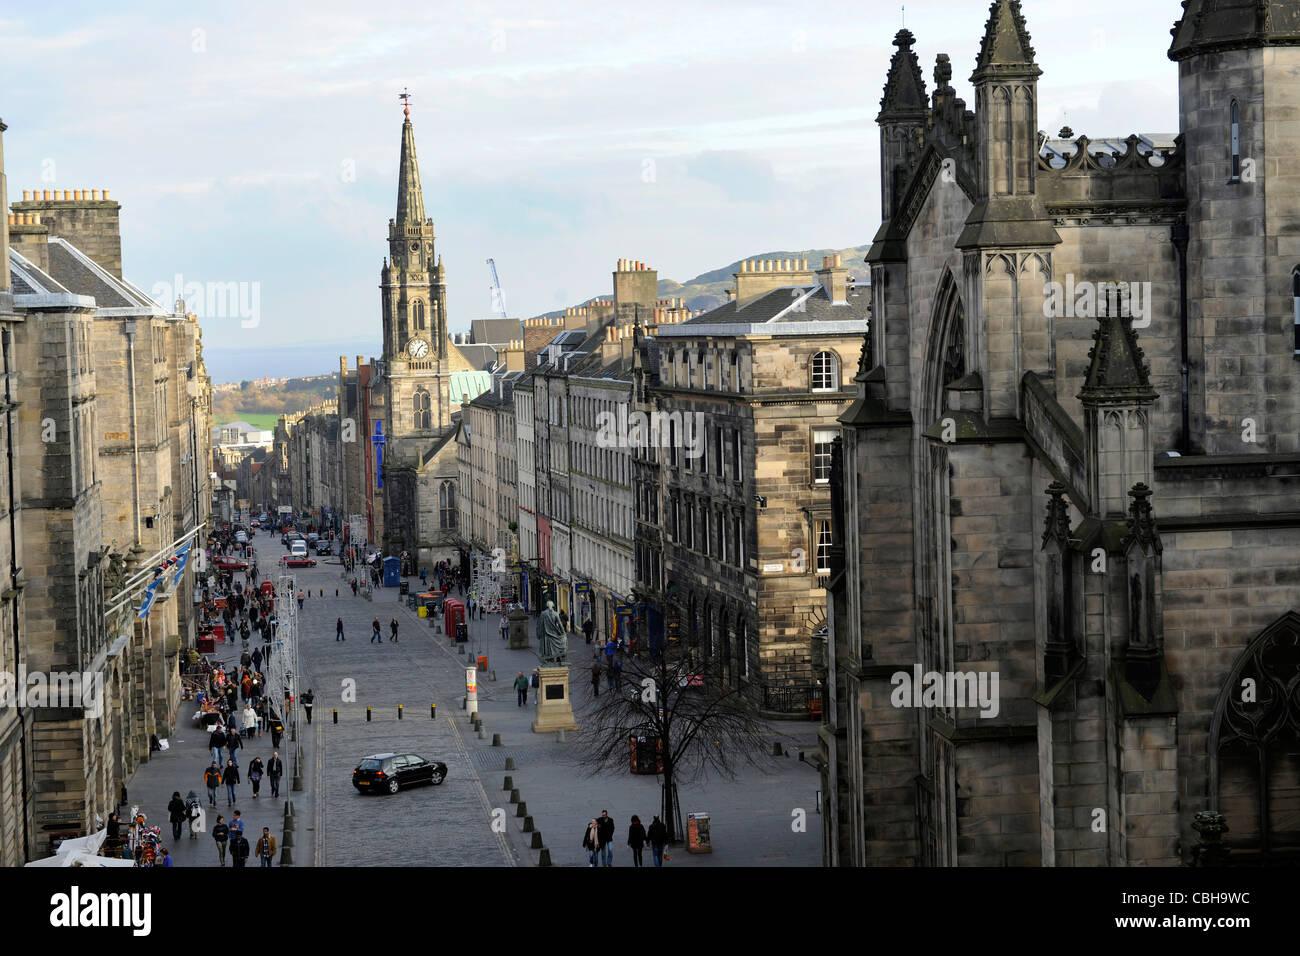 Royal Mile, Edinburgh, Scotland. - Stock Image